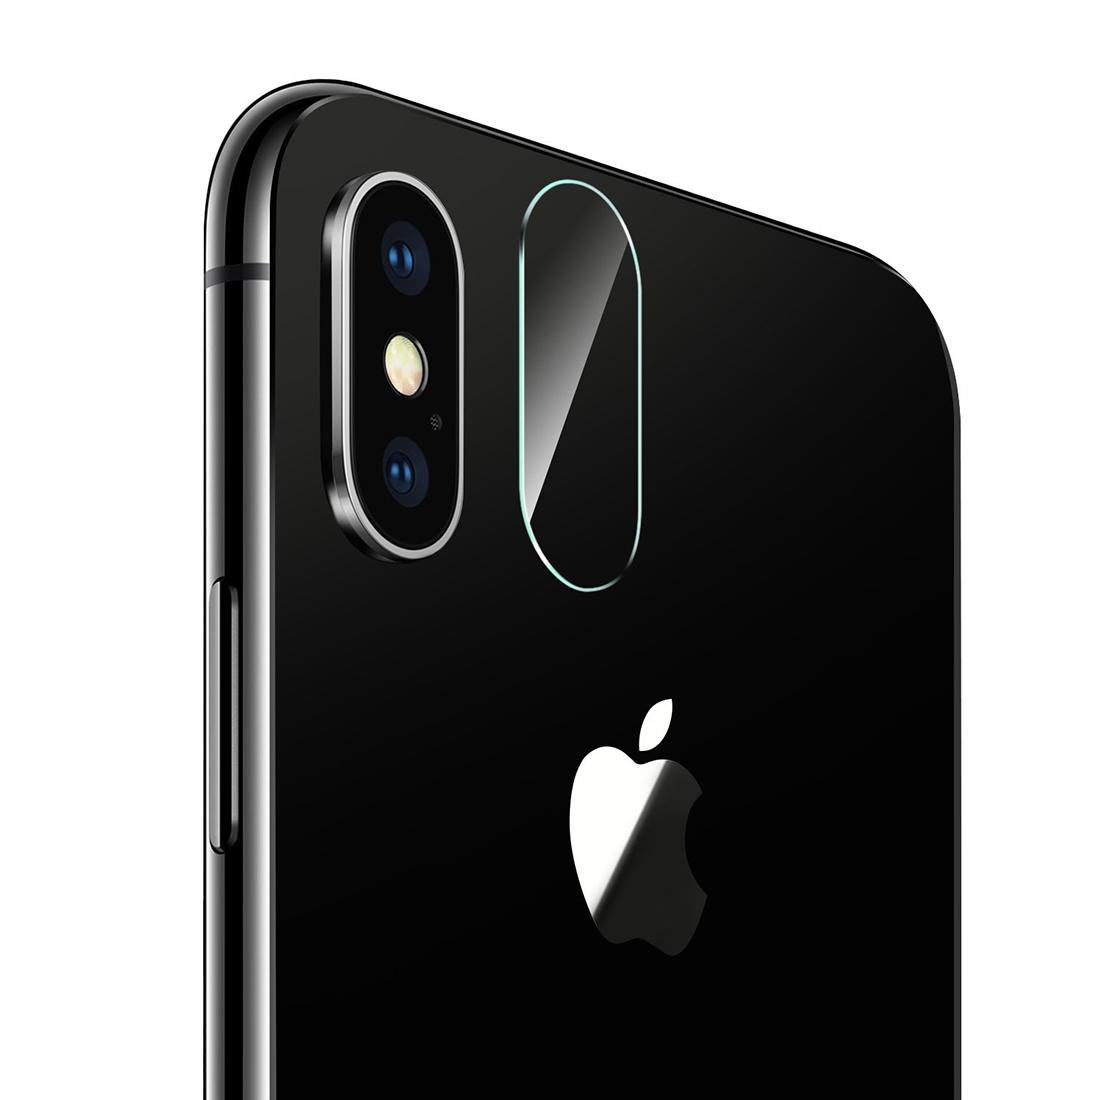 Verre trempé Apple iPhone X Protection ecran Protection verre trempé... par LeGuide.com Publicité